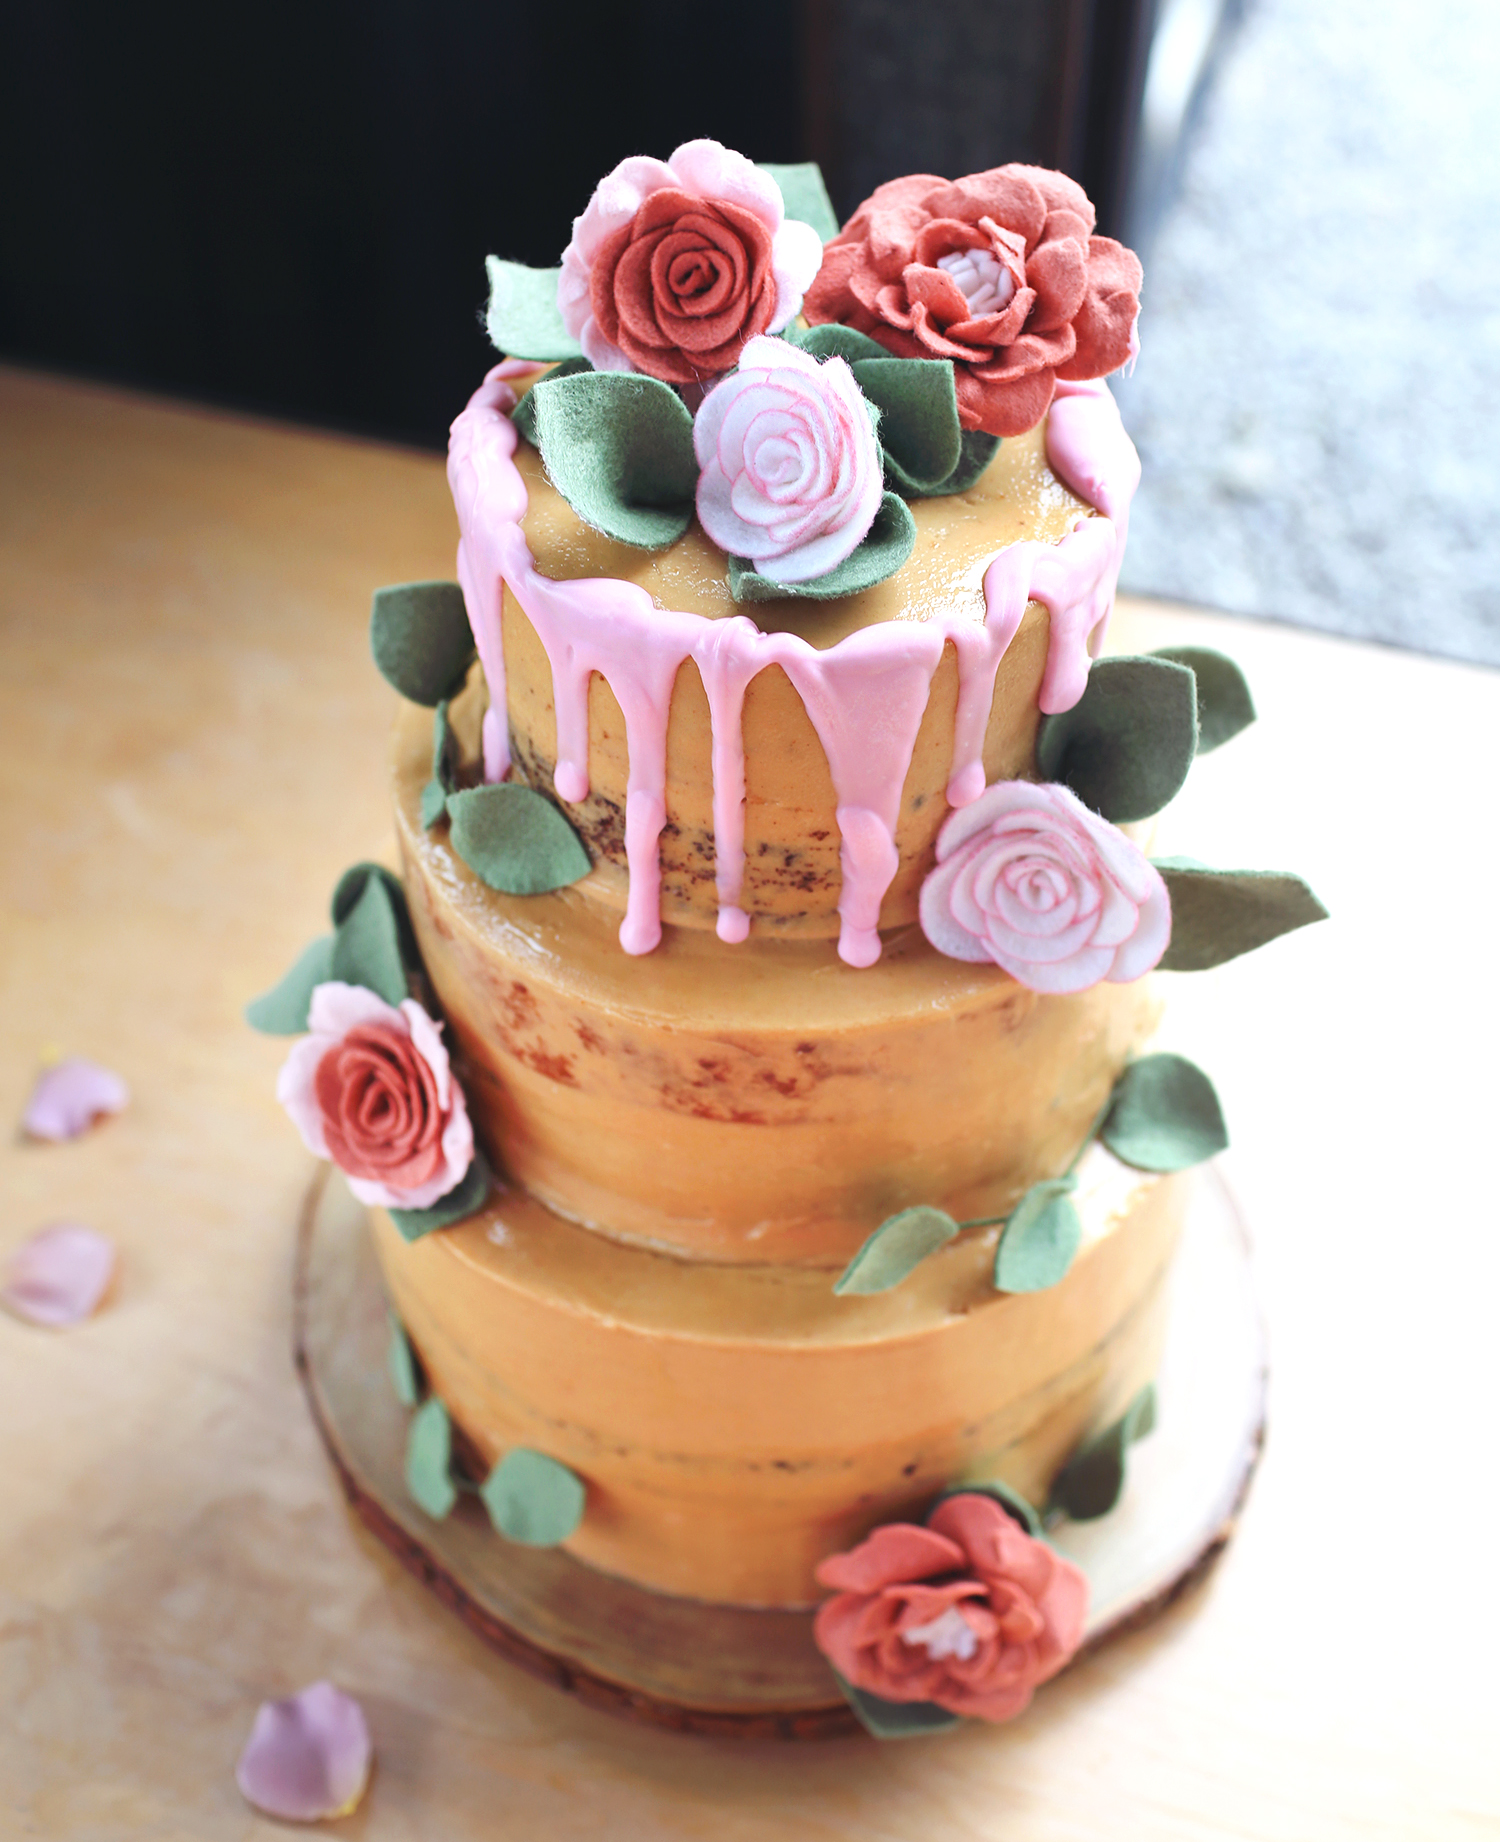 How To Make A Wedding Cake A Beautiful Mess